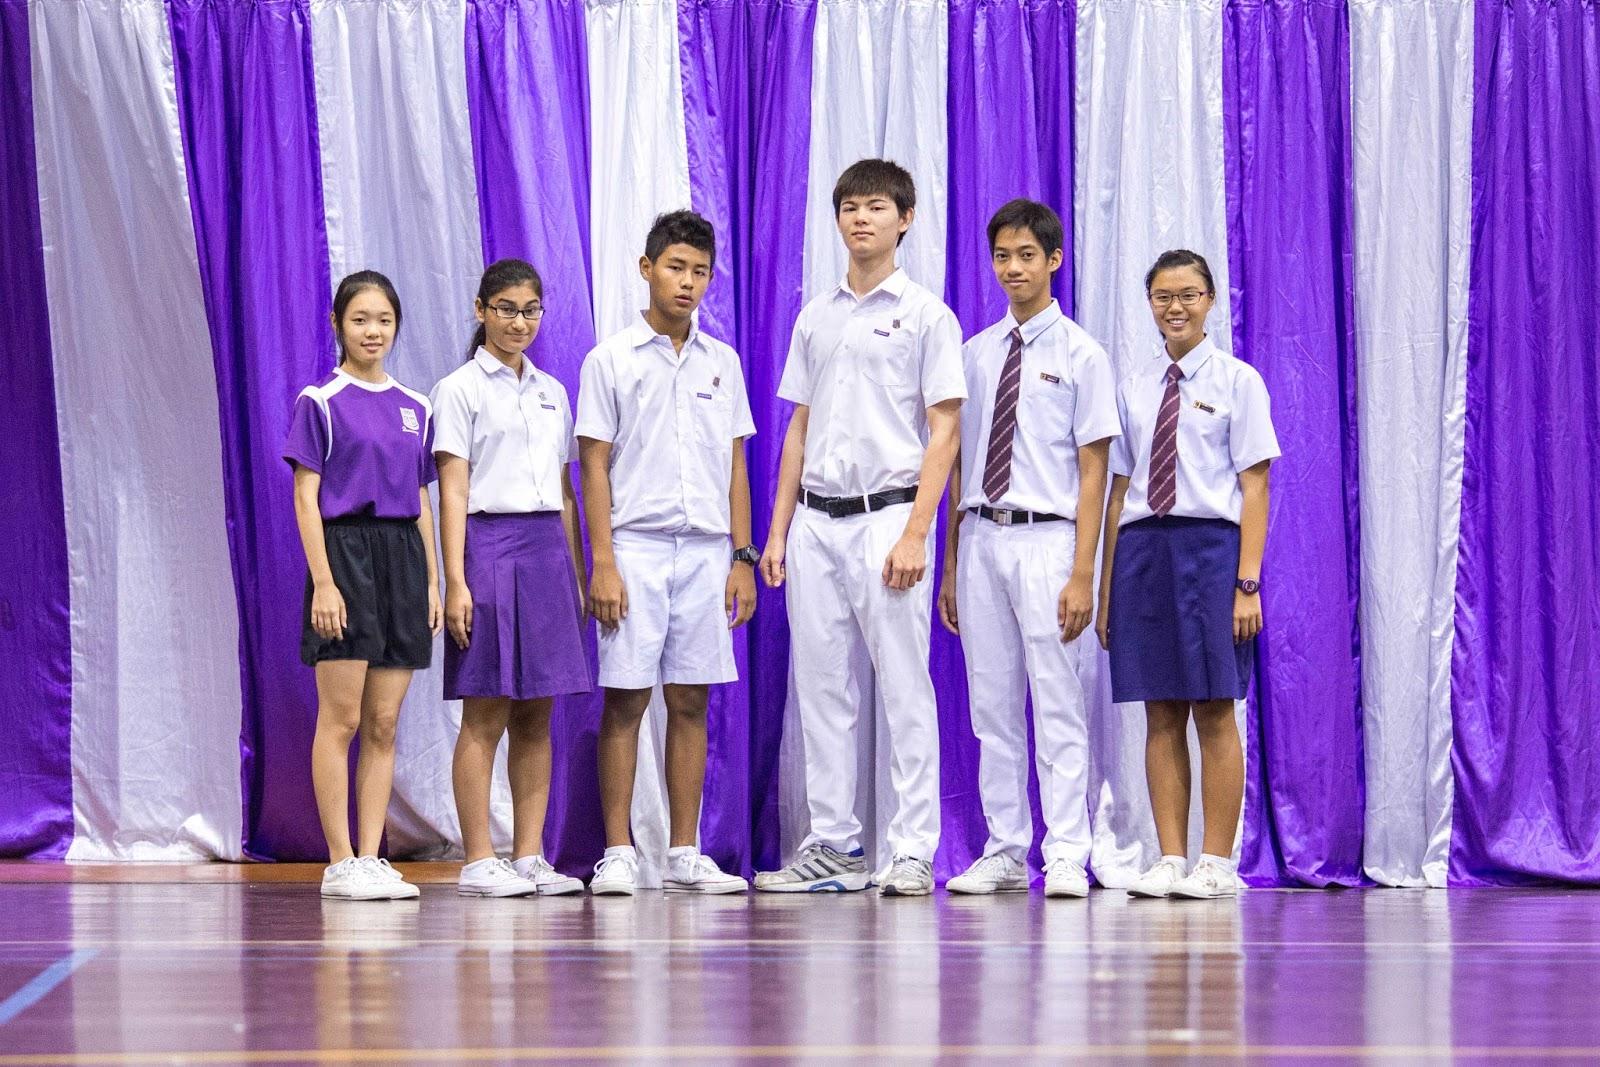 SSU Singapore School Uniforms: QSS Queensway Secondary School